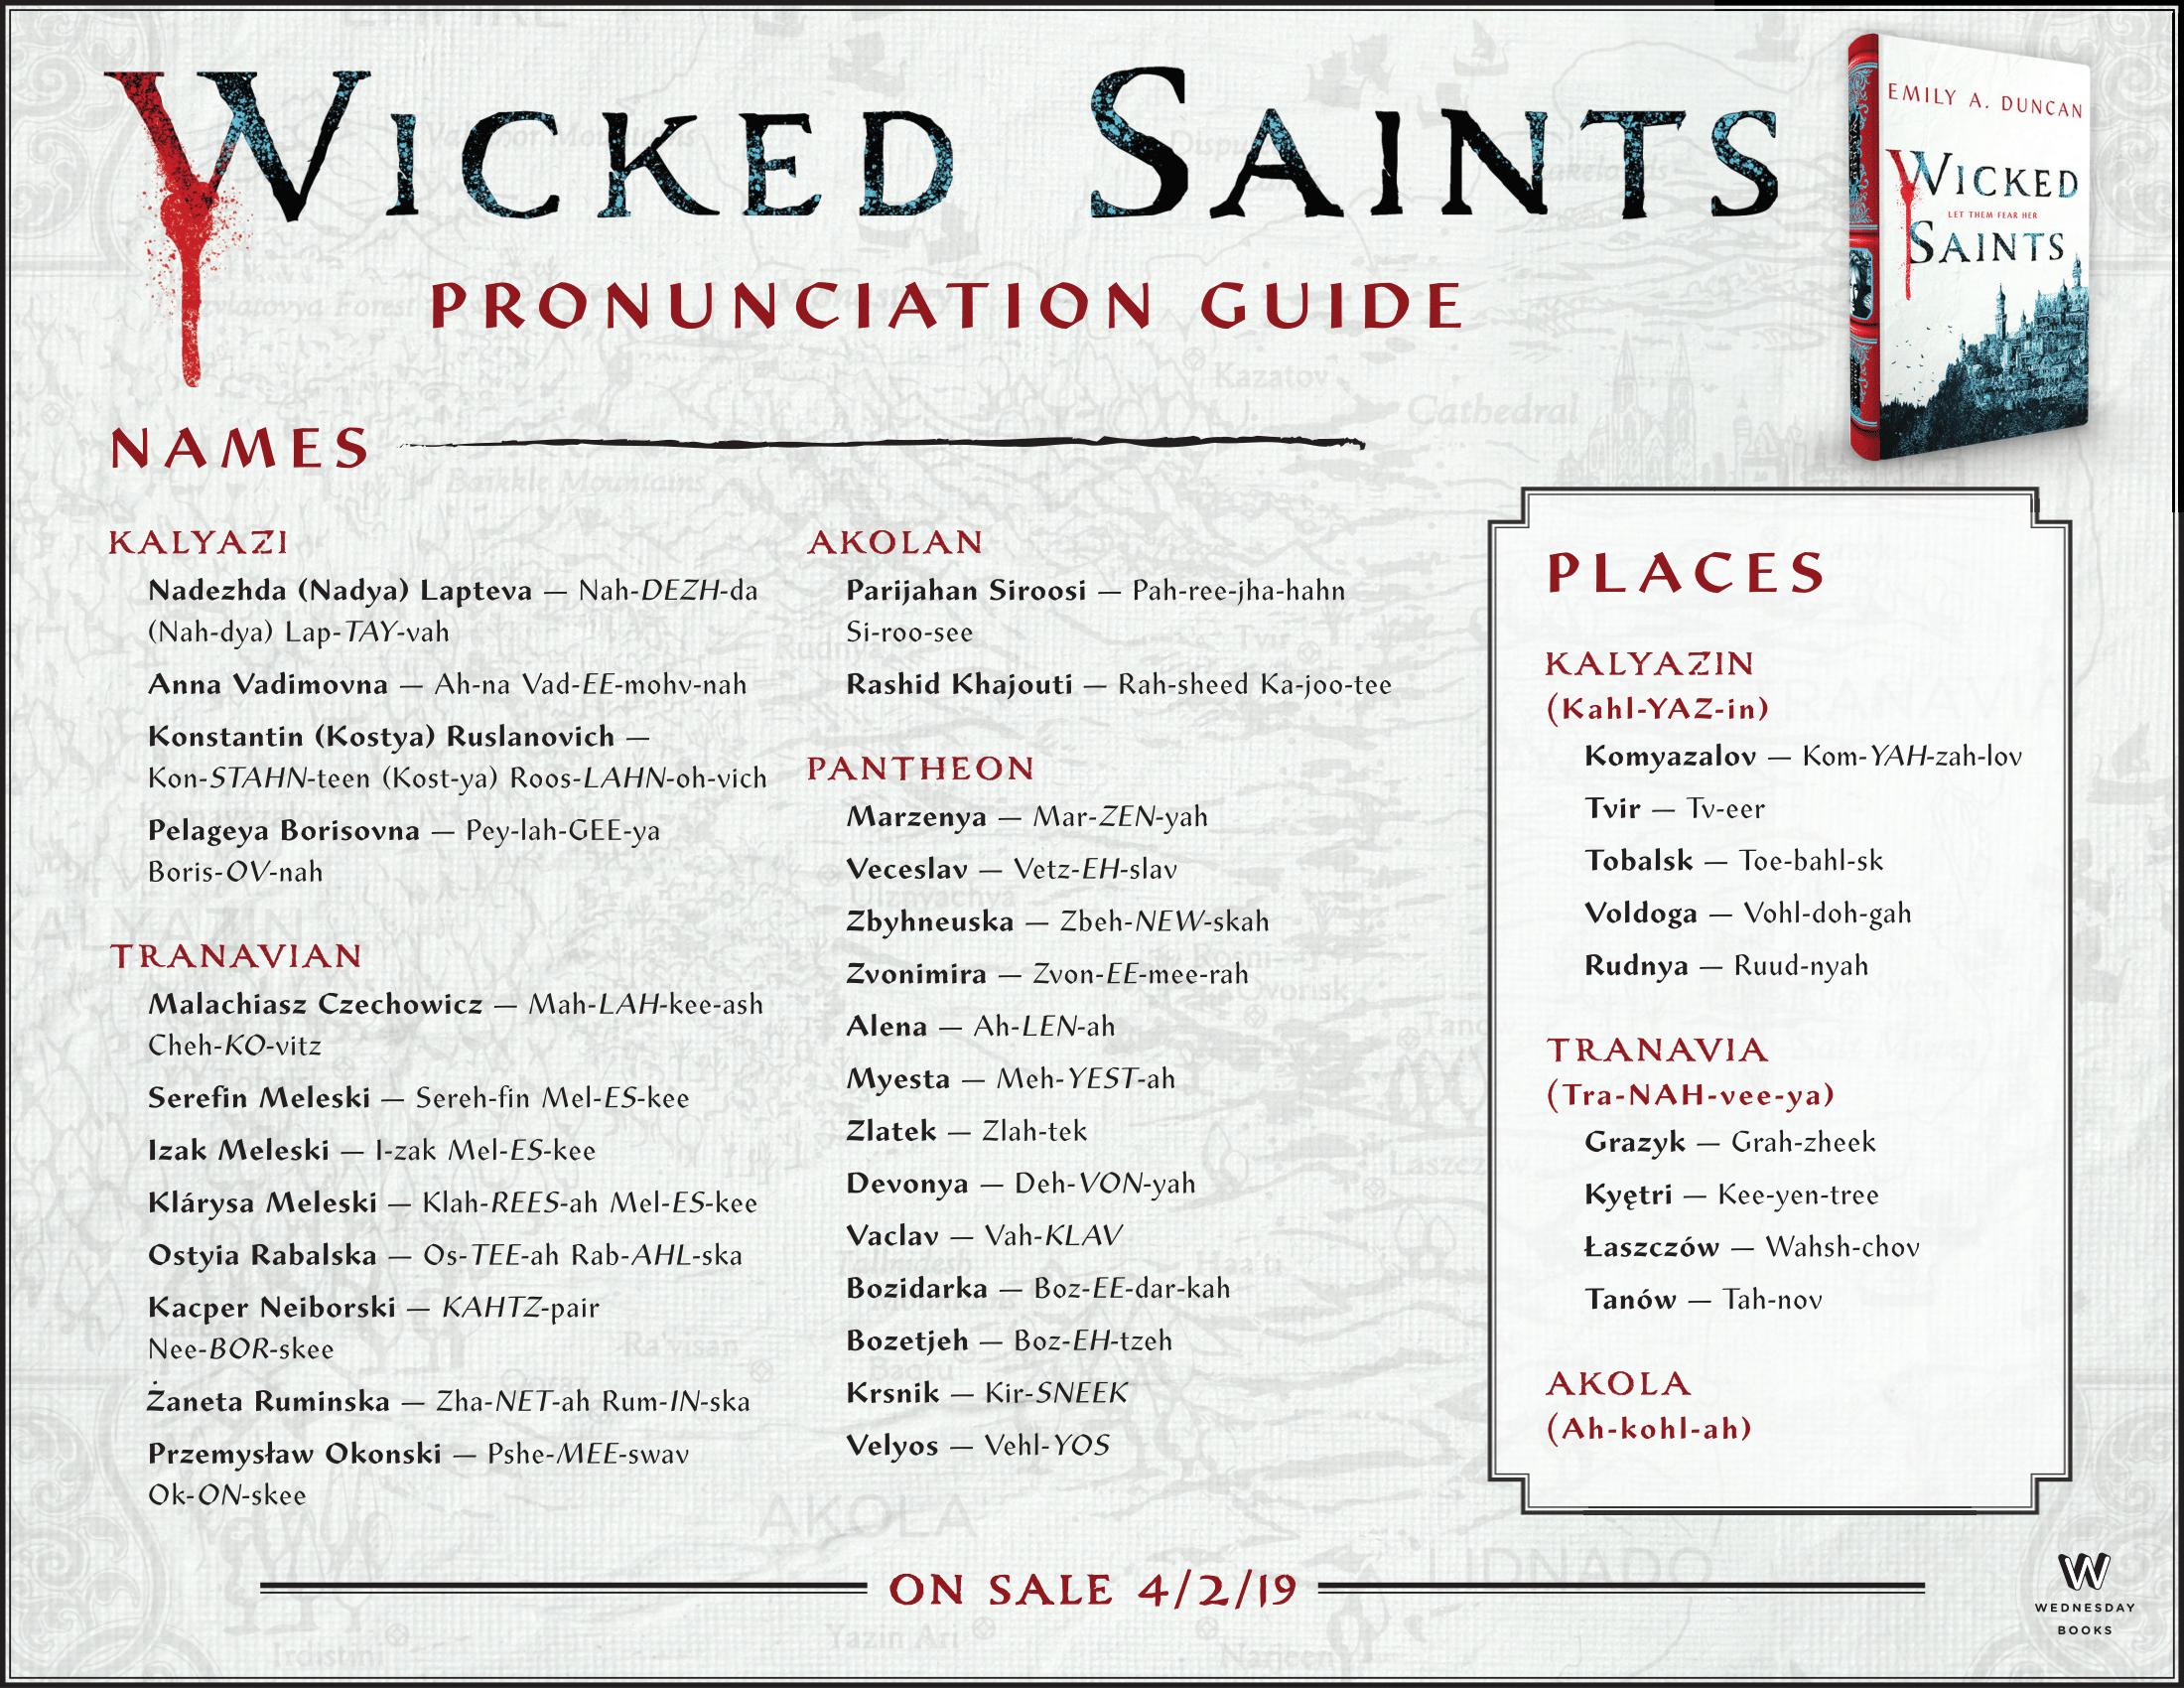 Wicked Saints Pronunciation Guide